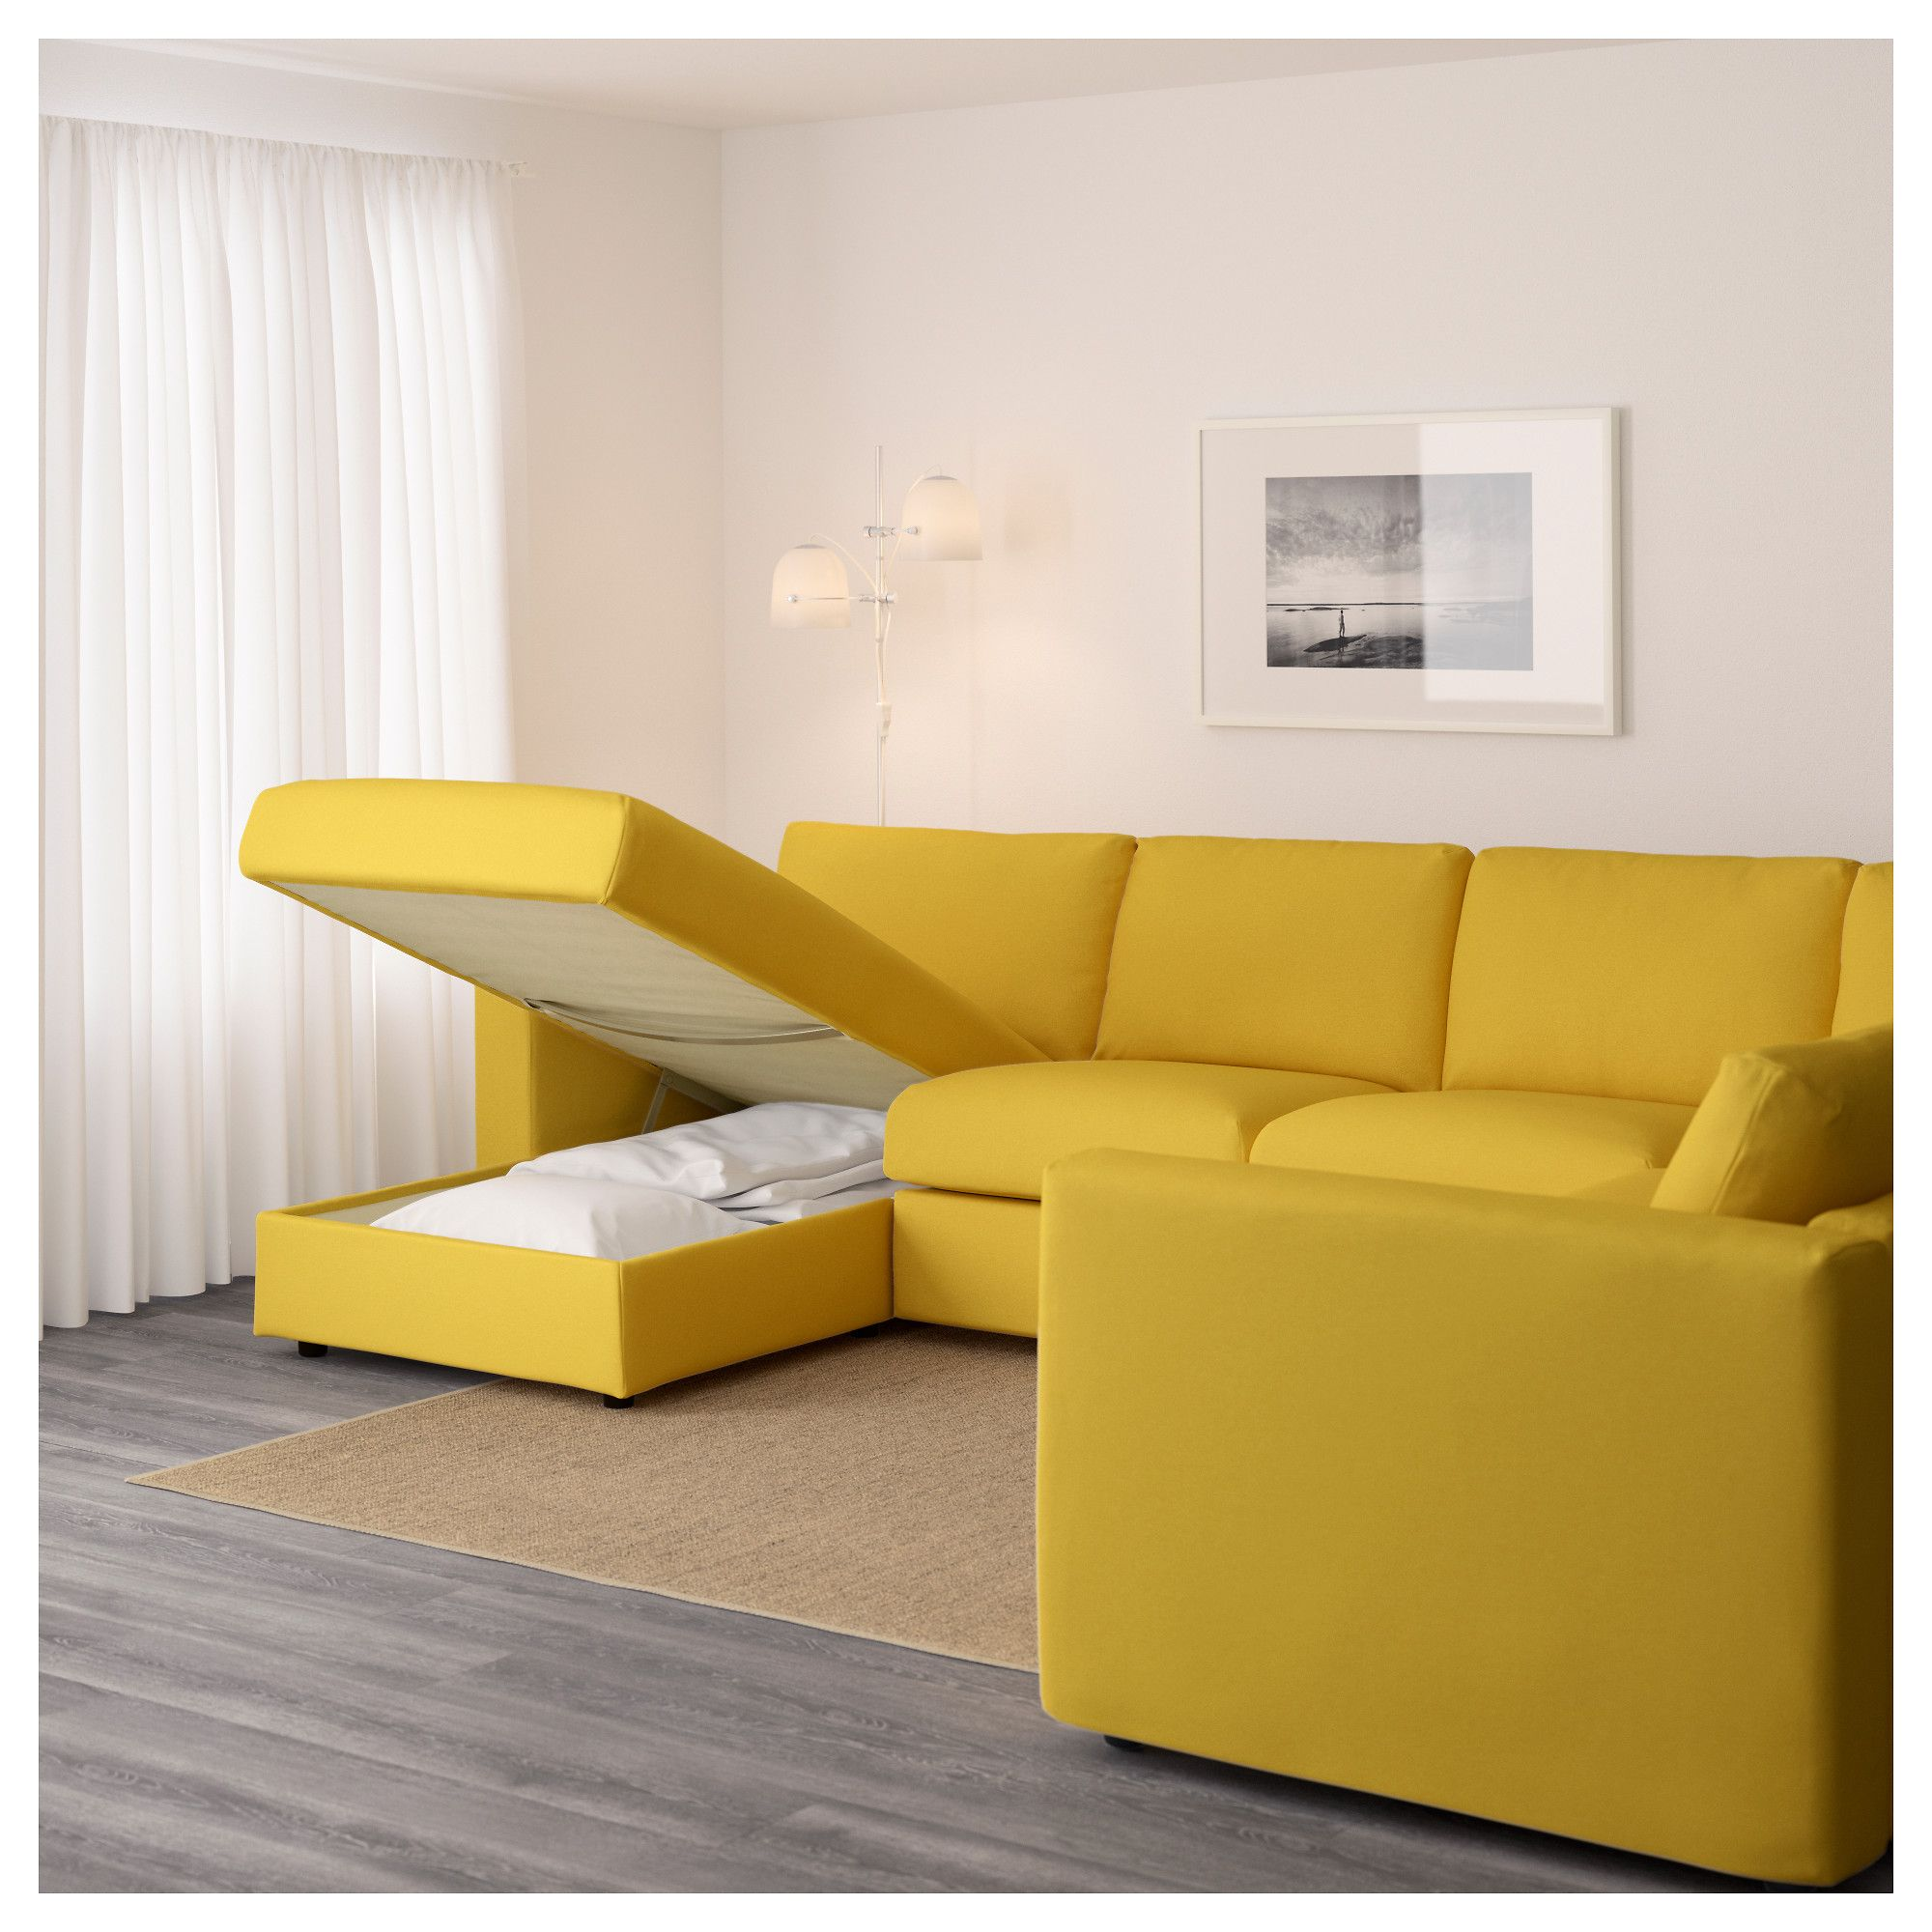 Furniture And Home Furnishings Furniture Ikea Vimle Sofa Big Comfy Chair